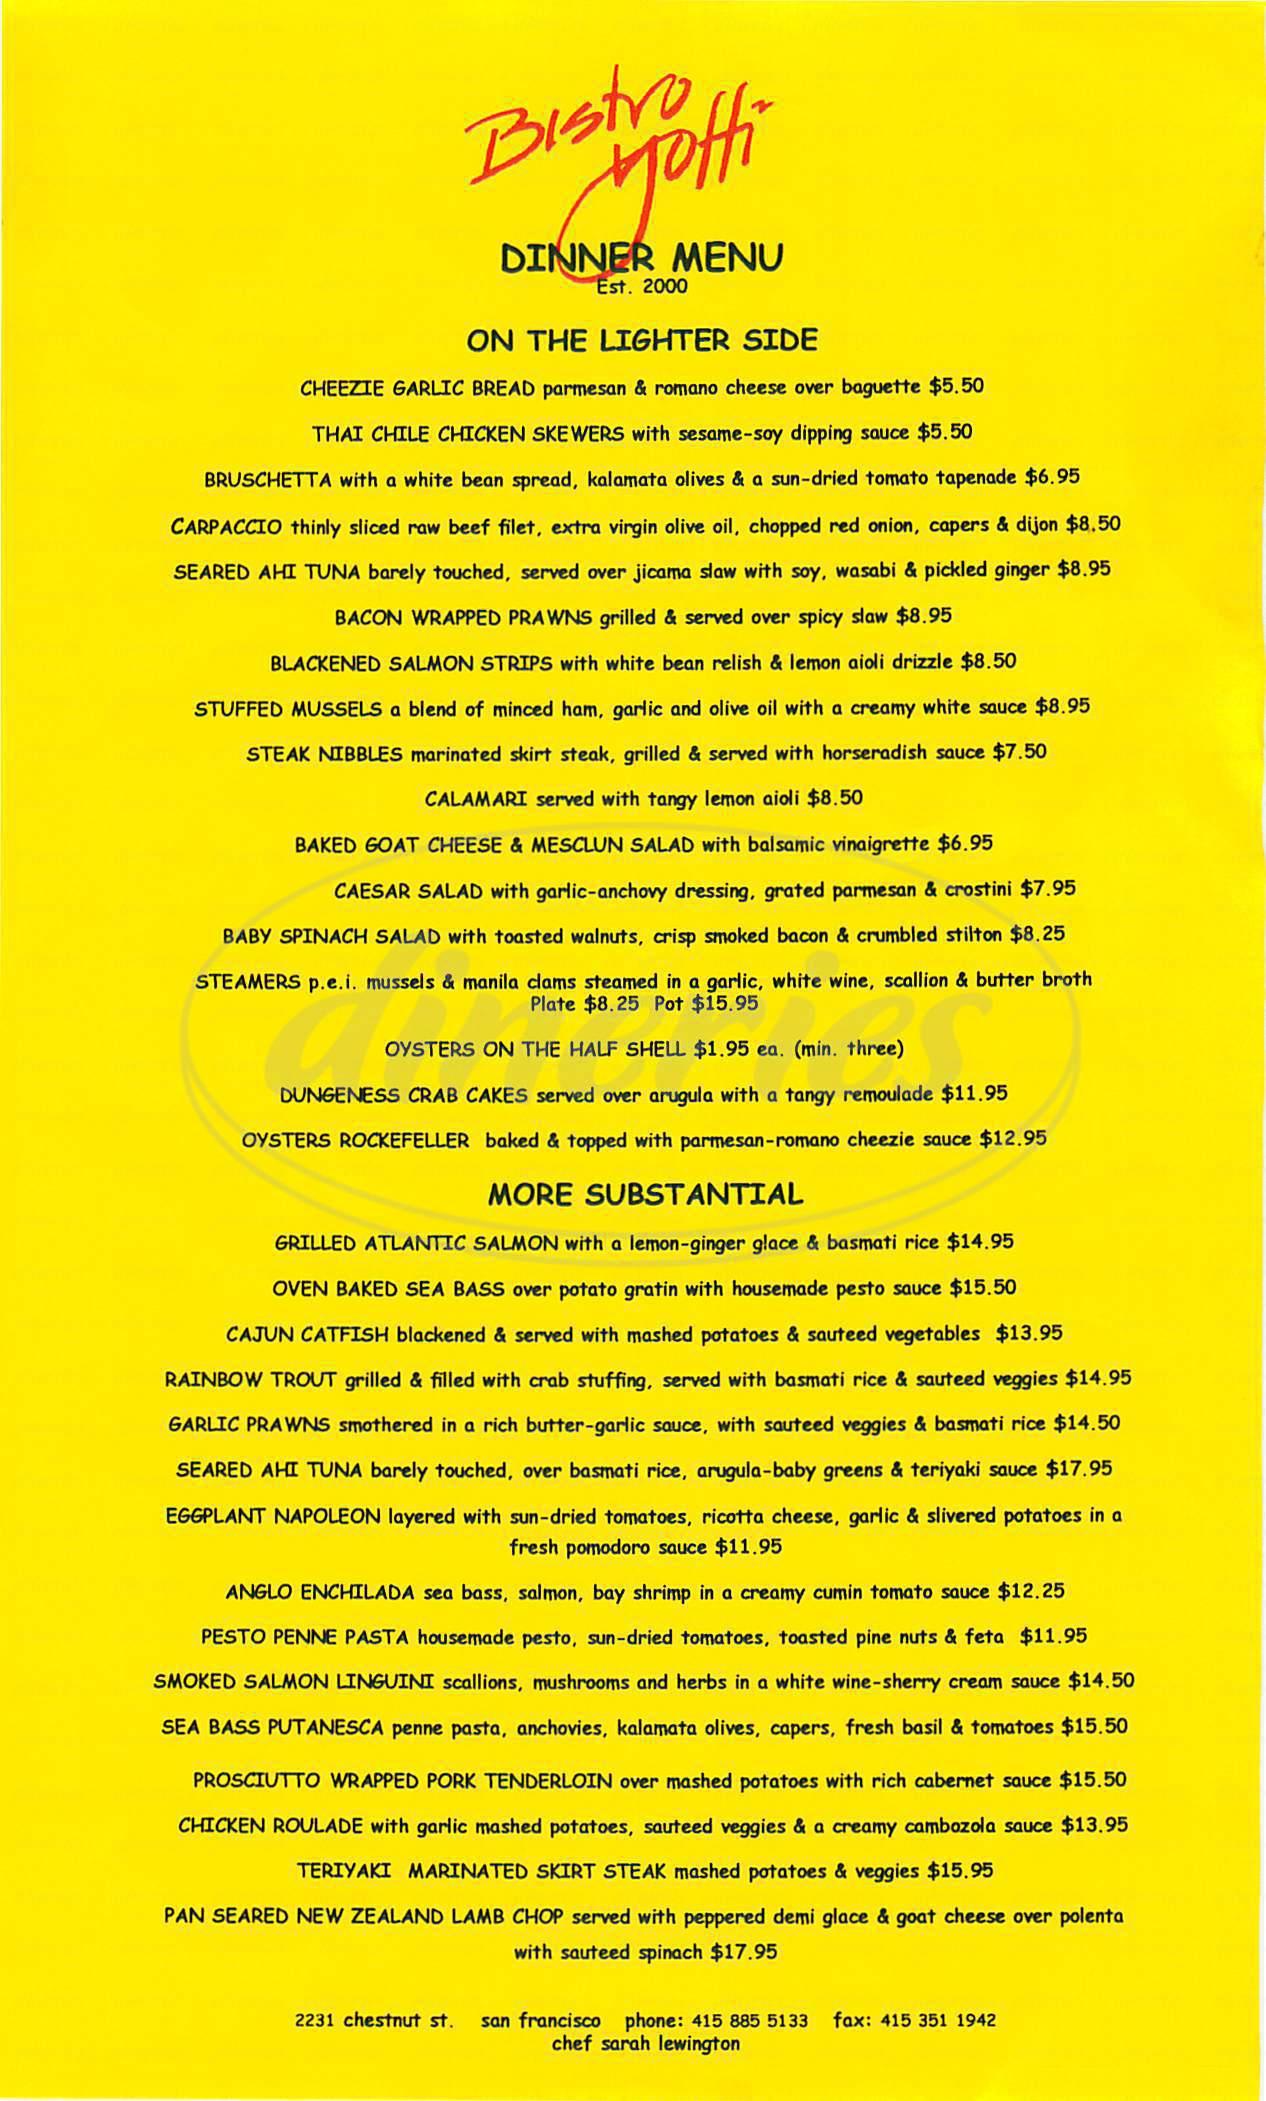 menu for Bistro Yoffi